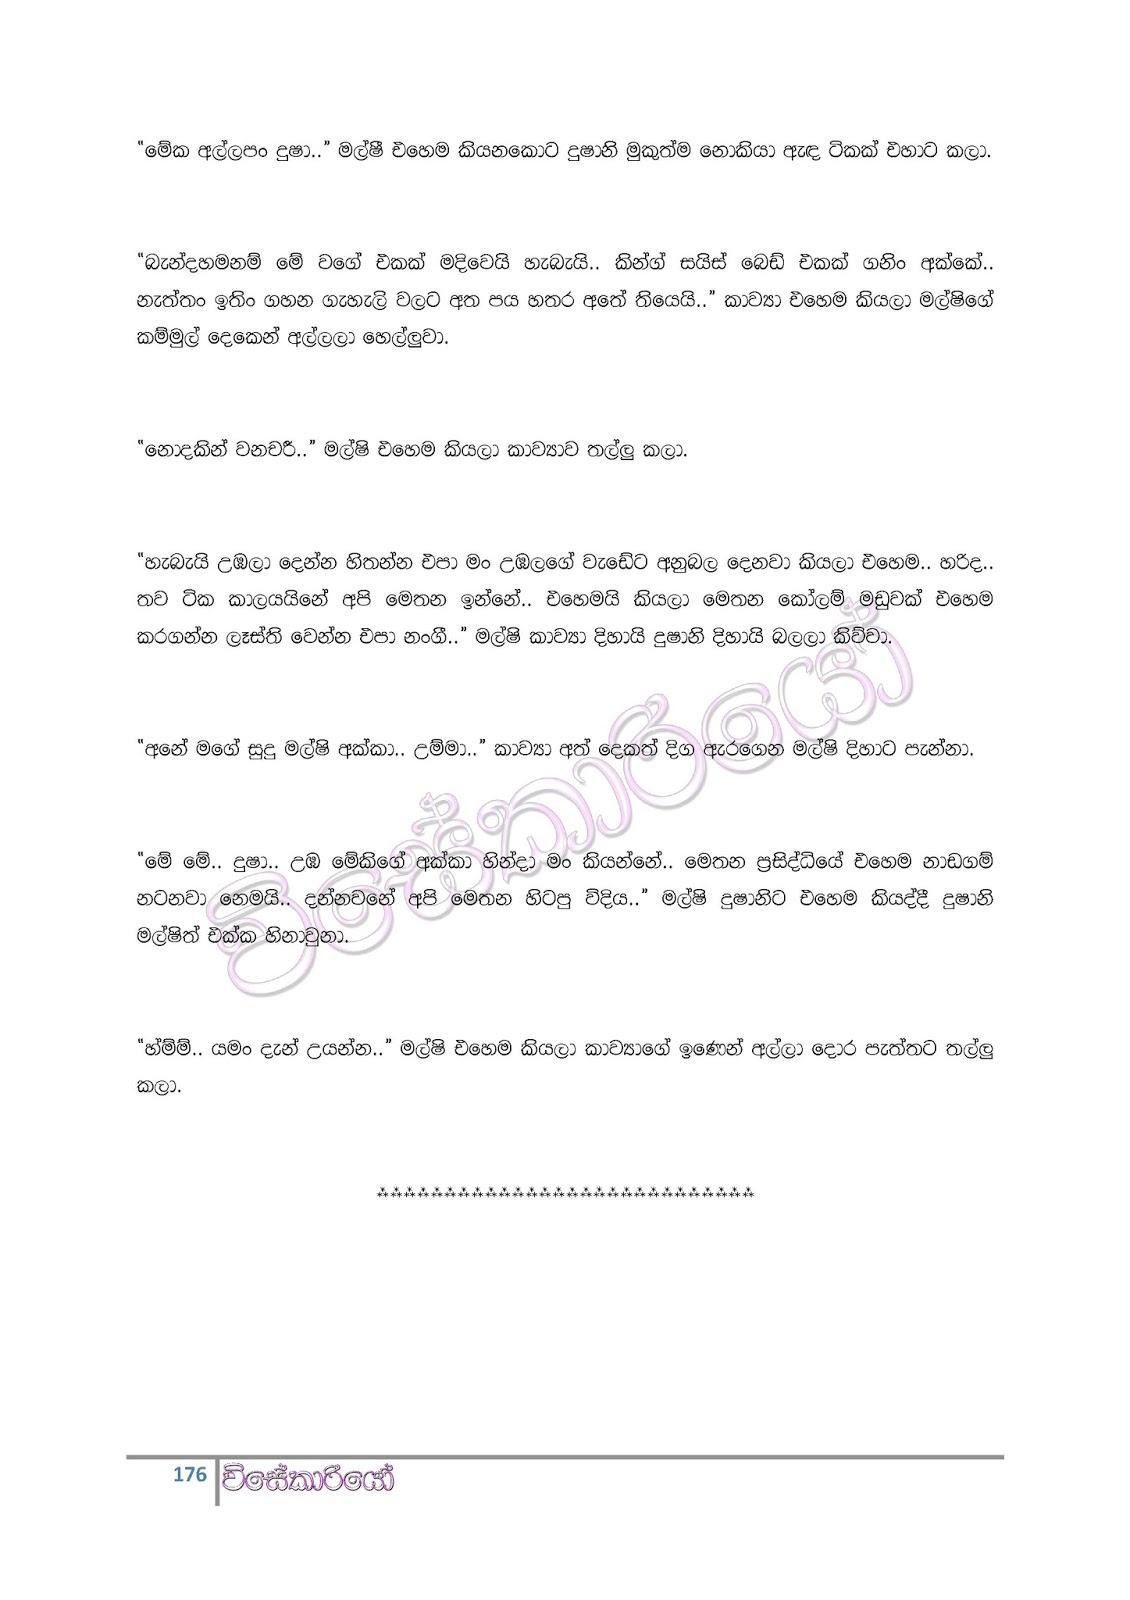 Wisekariyo 9 Aluth Wal Katha Sinhalen Sinhala Wal Katha